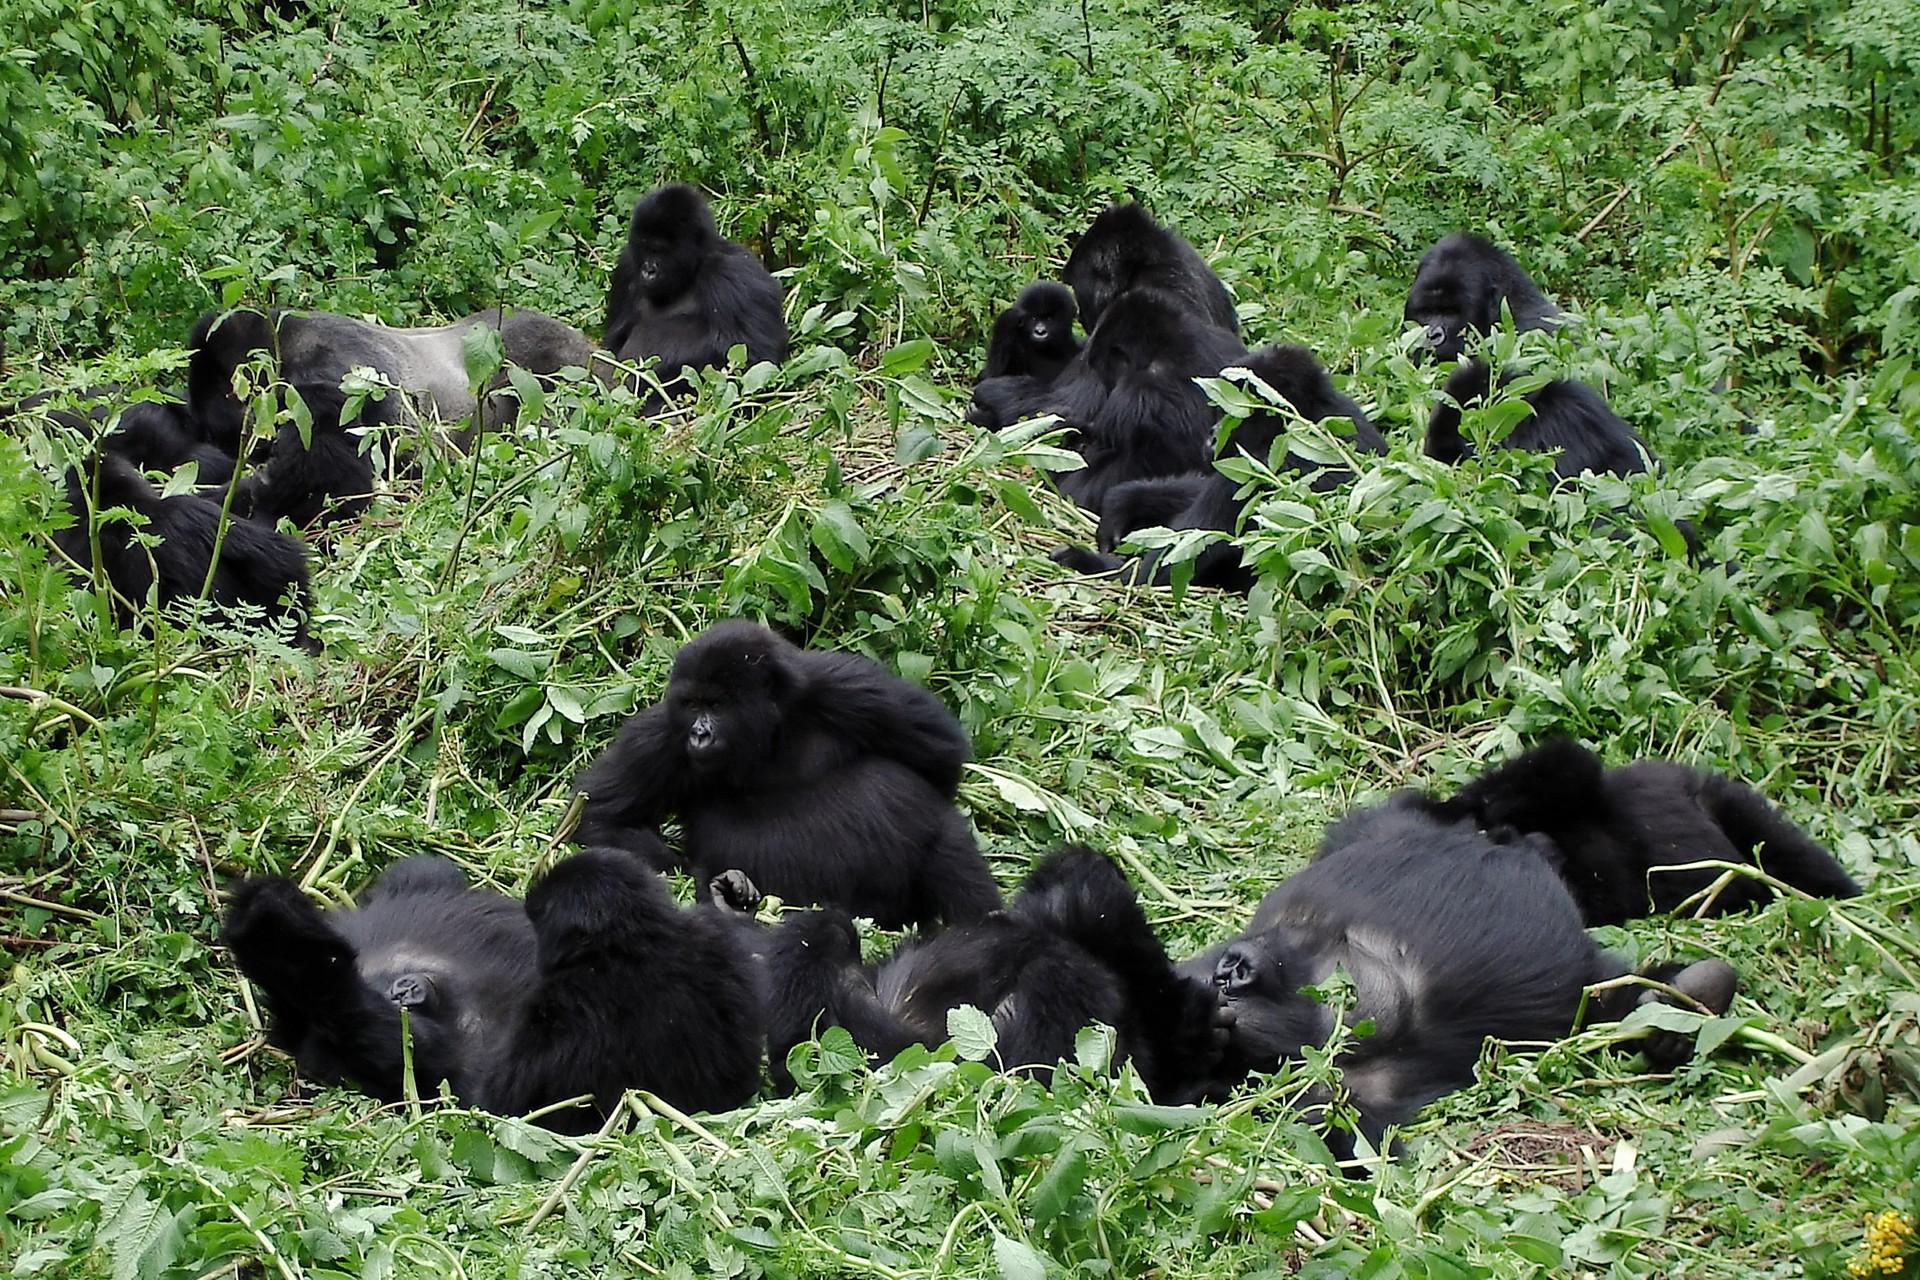 family of mountain gorillas in Bwindi National Park Uganda